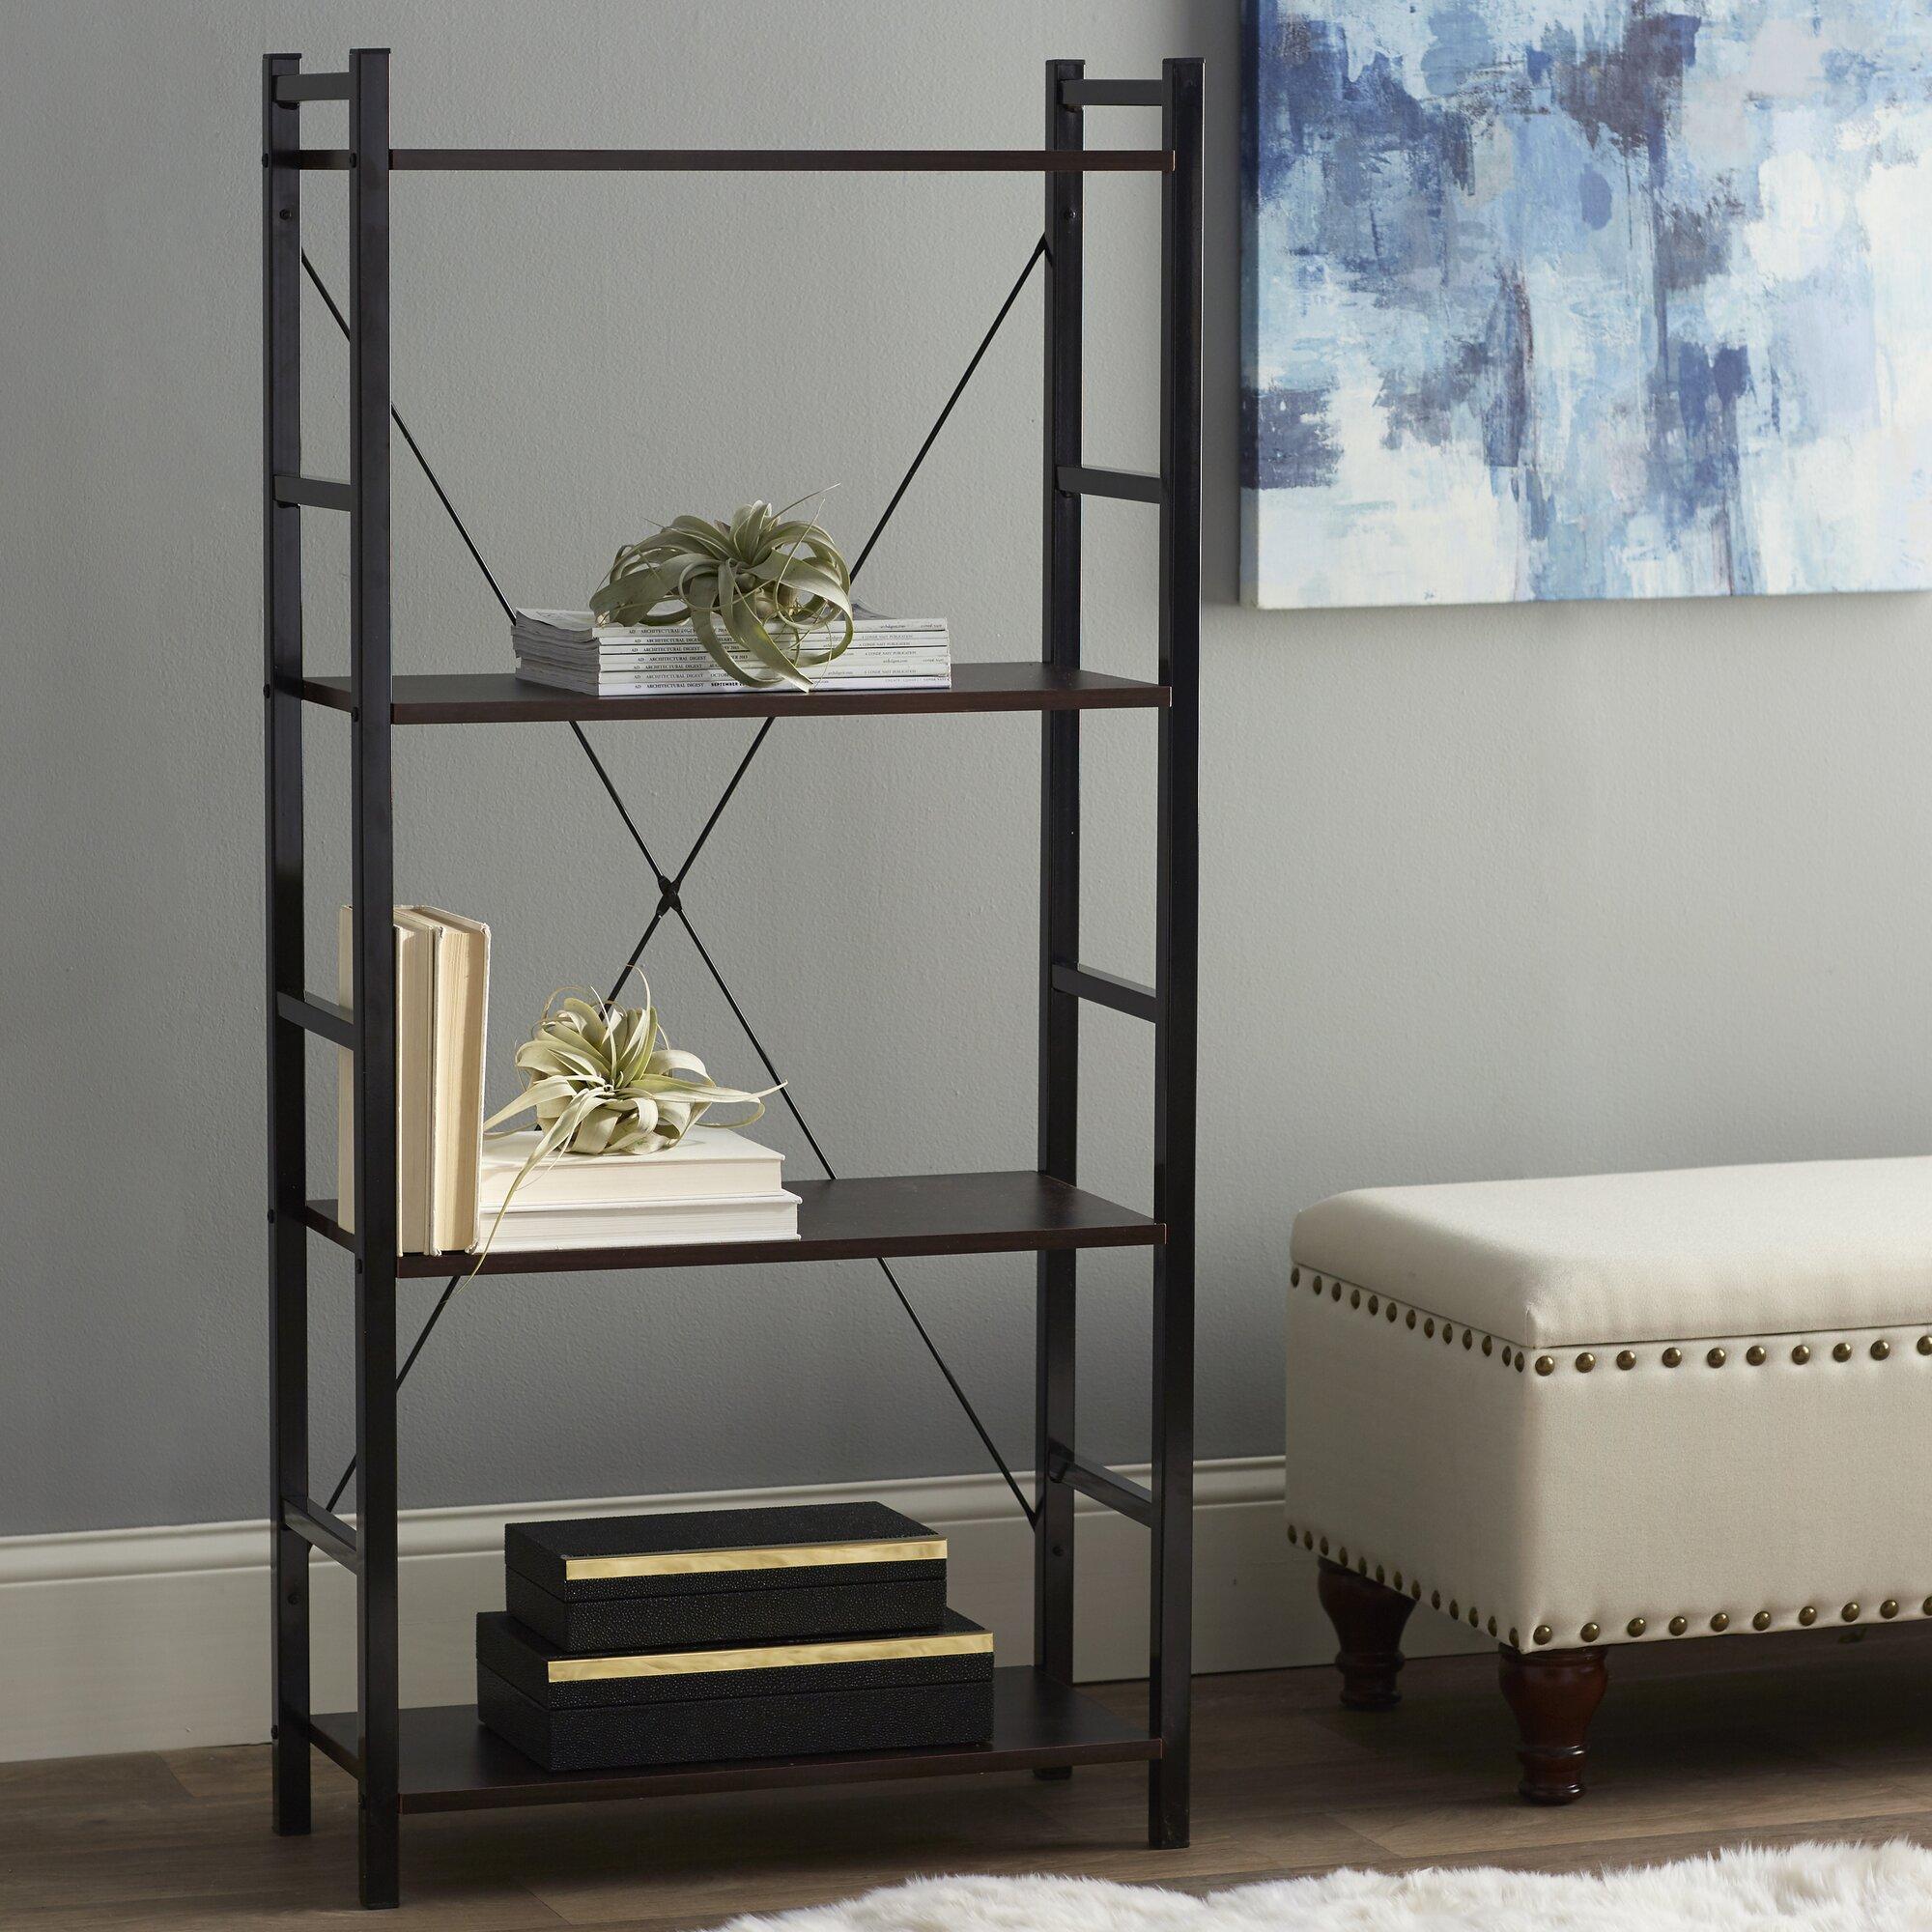 zipcode design 55 etagere bookcase reviews. Black Bedroom Furniture Sets. Home Design Ideas